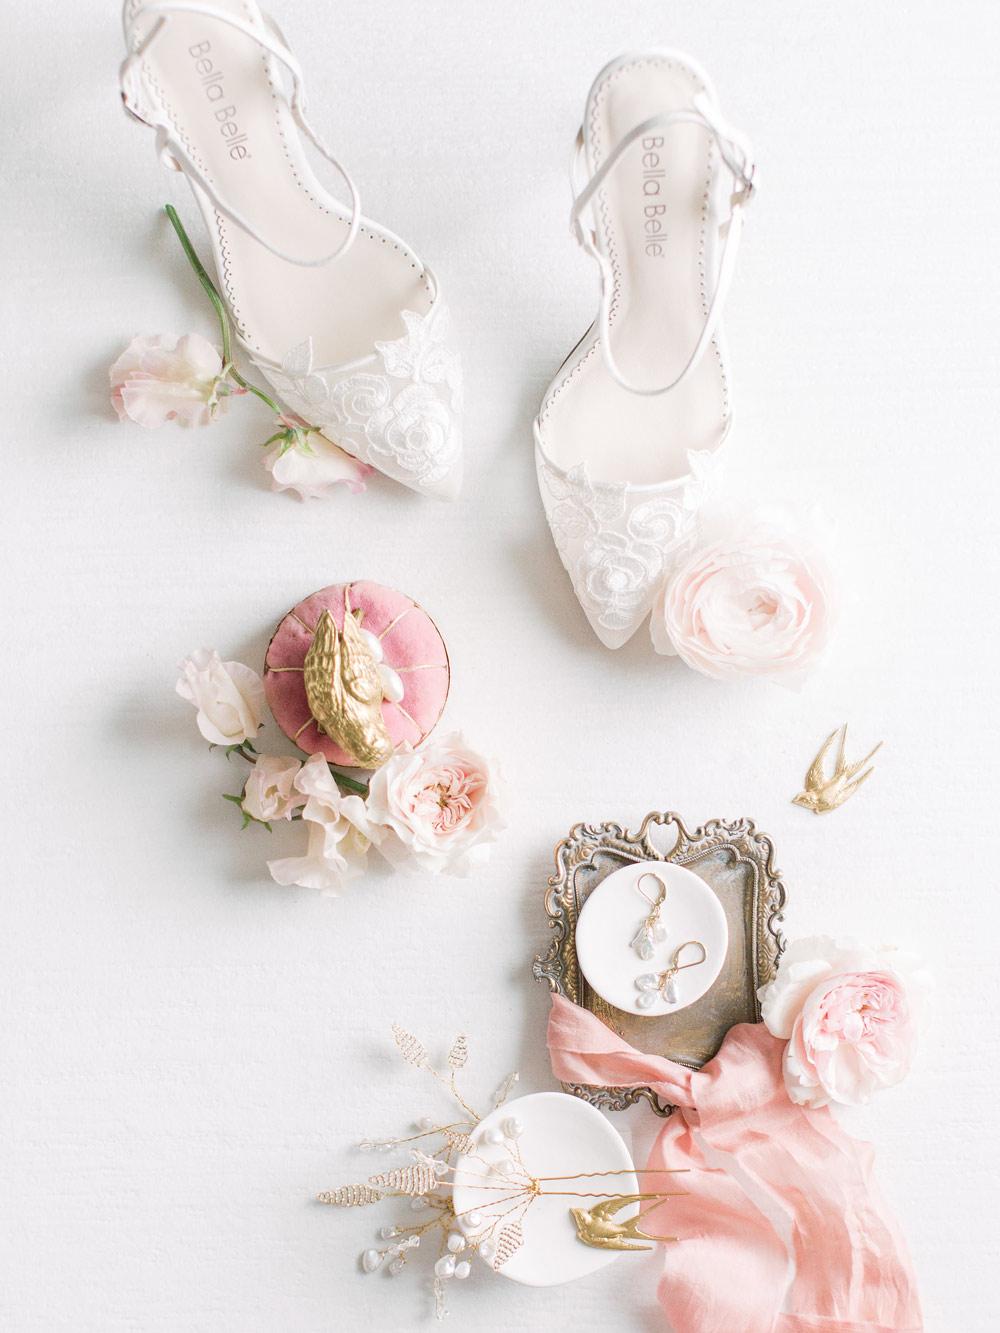 Peach keshi pearl bridal hair comb handcrafted by Carrie Whelan Designs